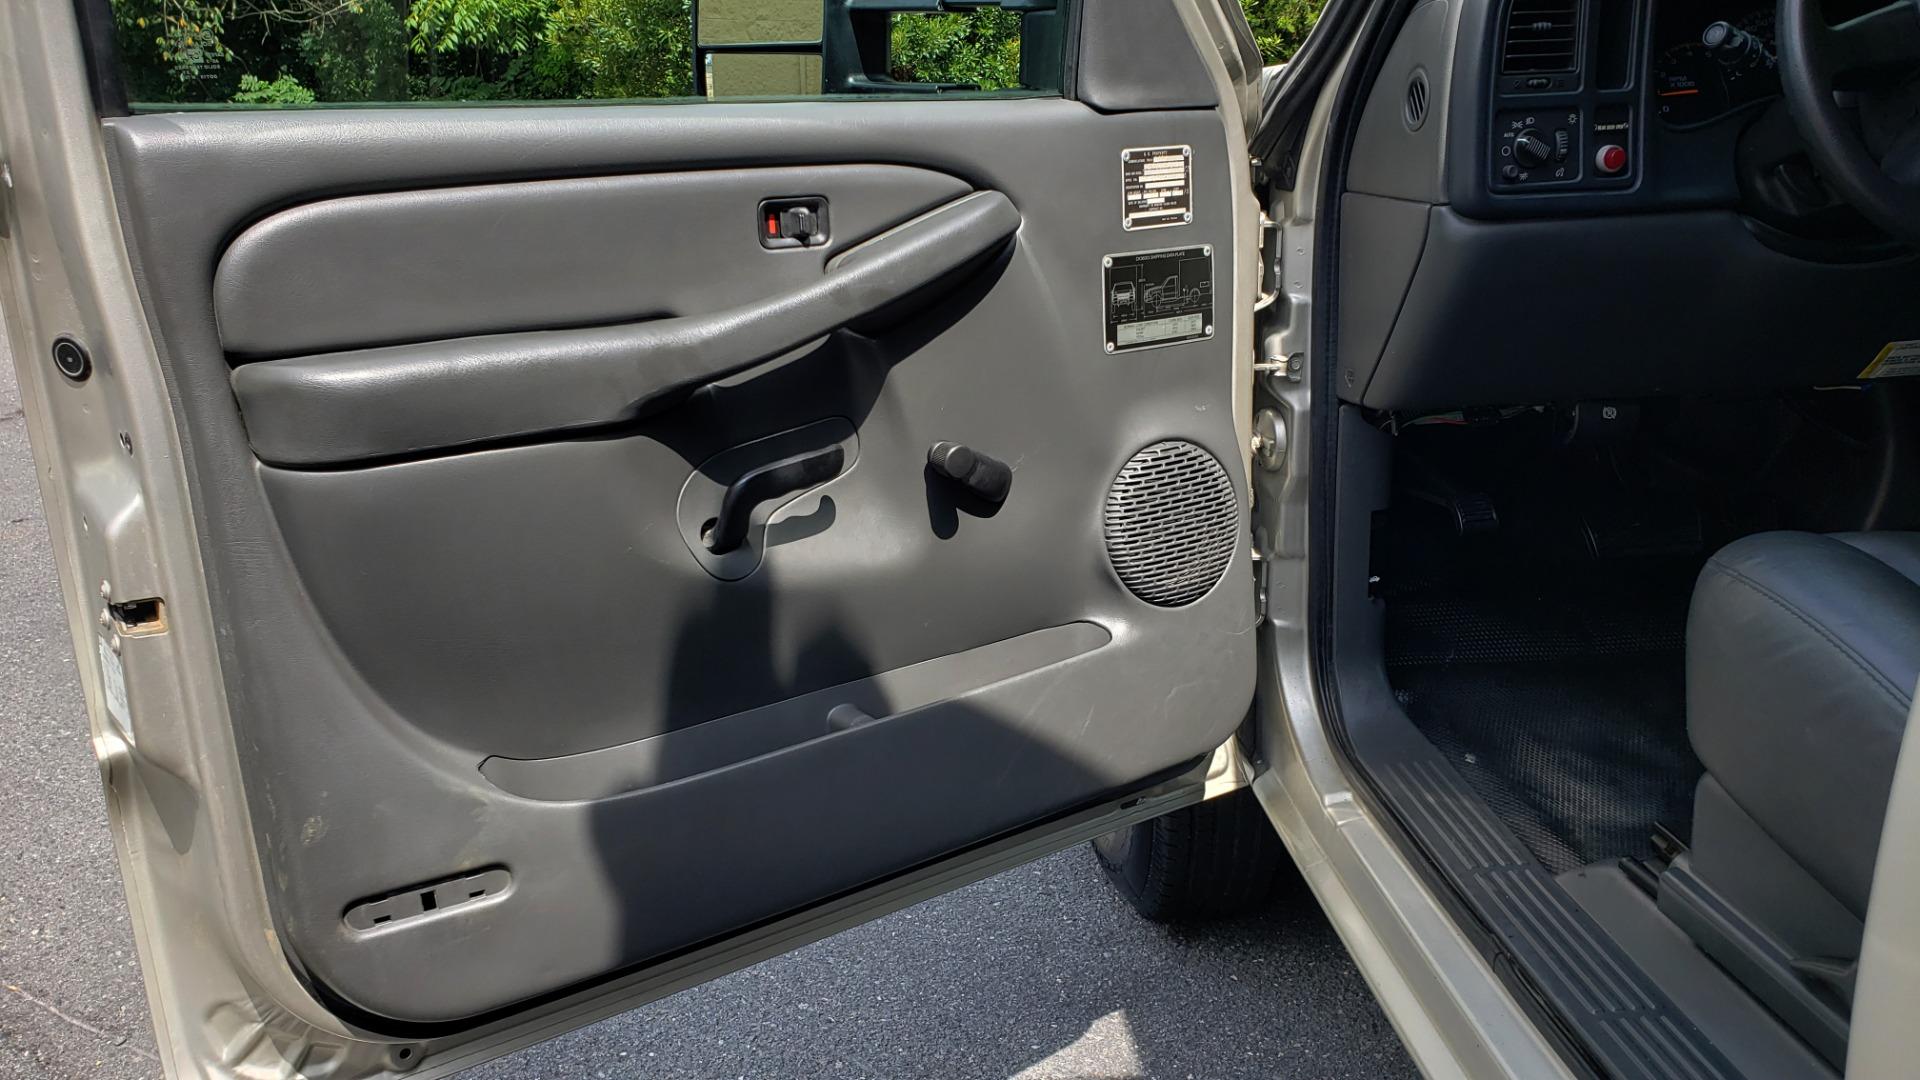 Used 2005 Chevrolet SILVERADO 3500 DRW / 4WD / REG CAB / 6.6L DURAMAX / DOOMSDAY PREPPER for sale $21,595 at Formula Imports in Charlotte NC 28227 30